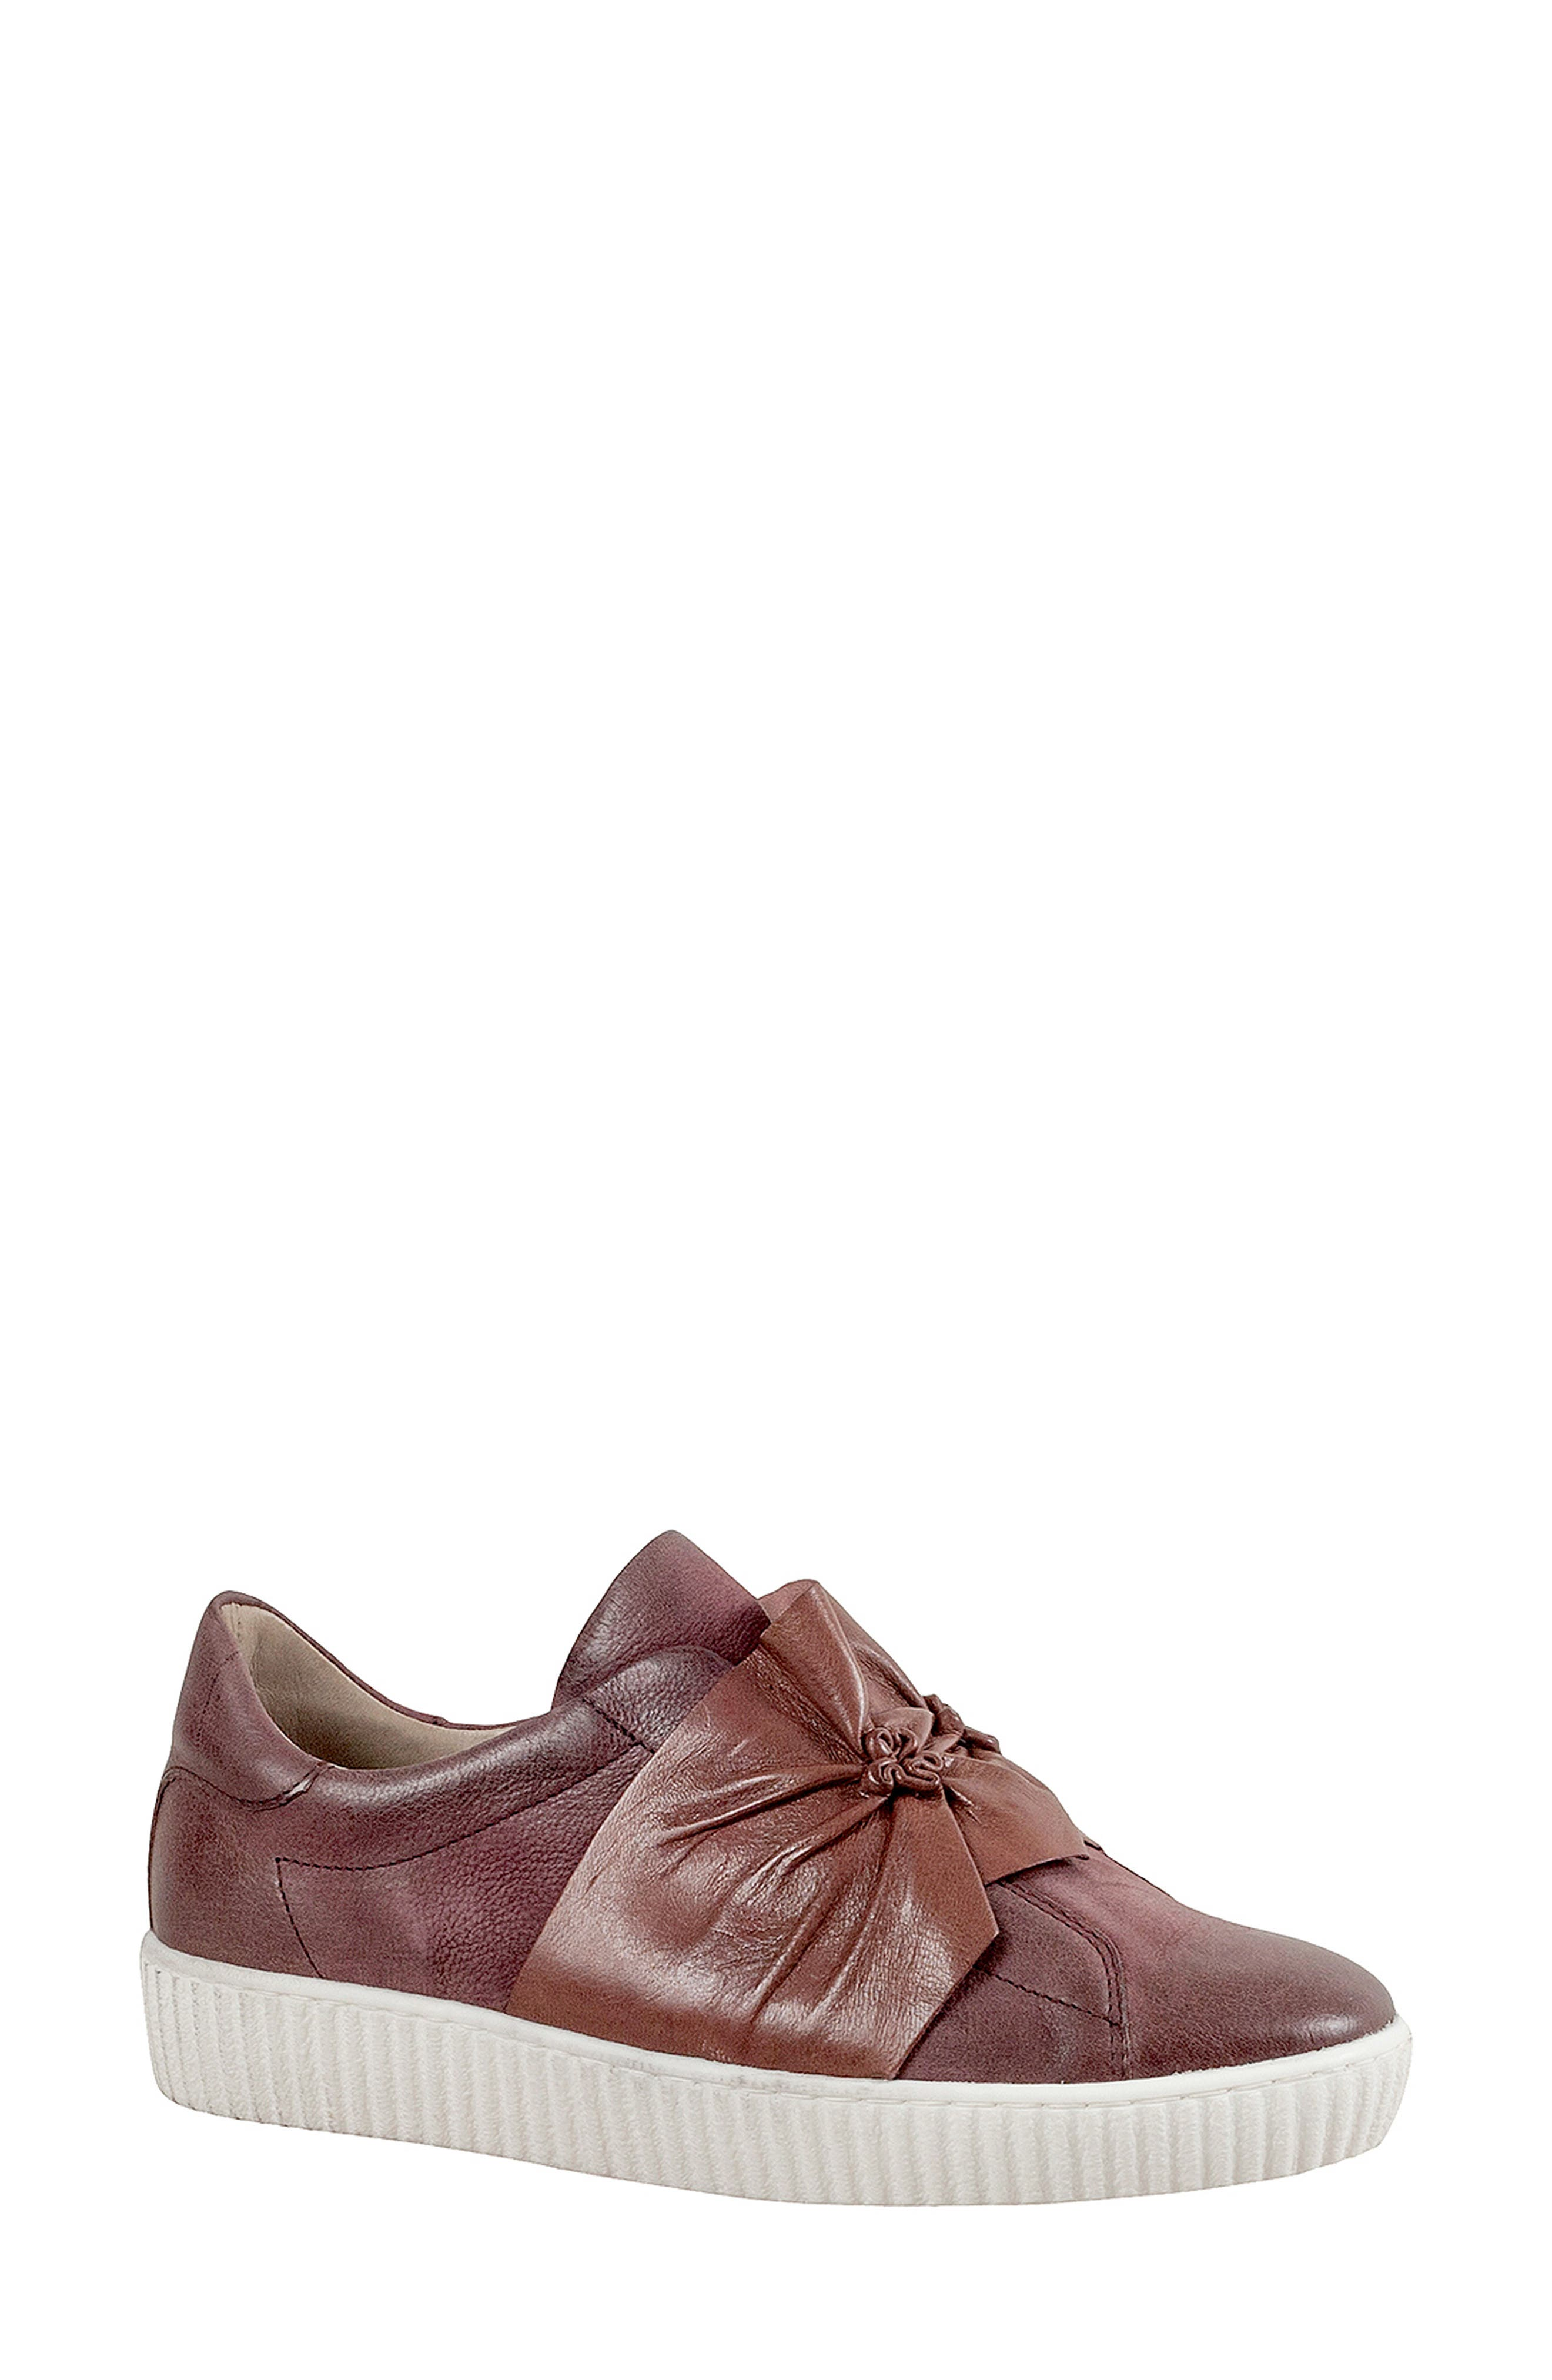 Miz Mooz Orbit Slip-On Sneaker Burgundy